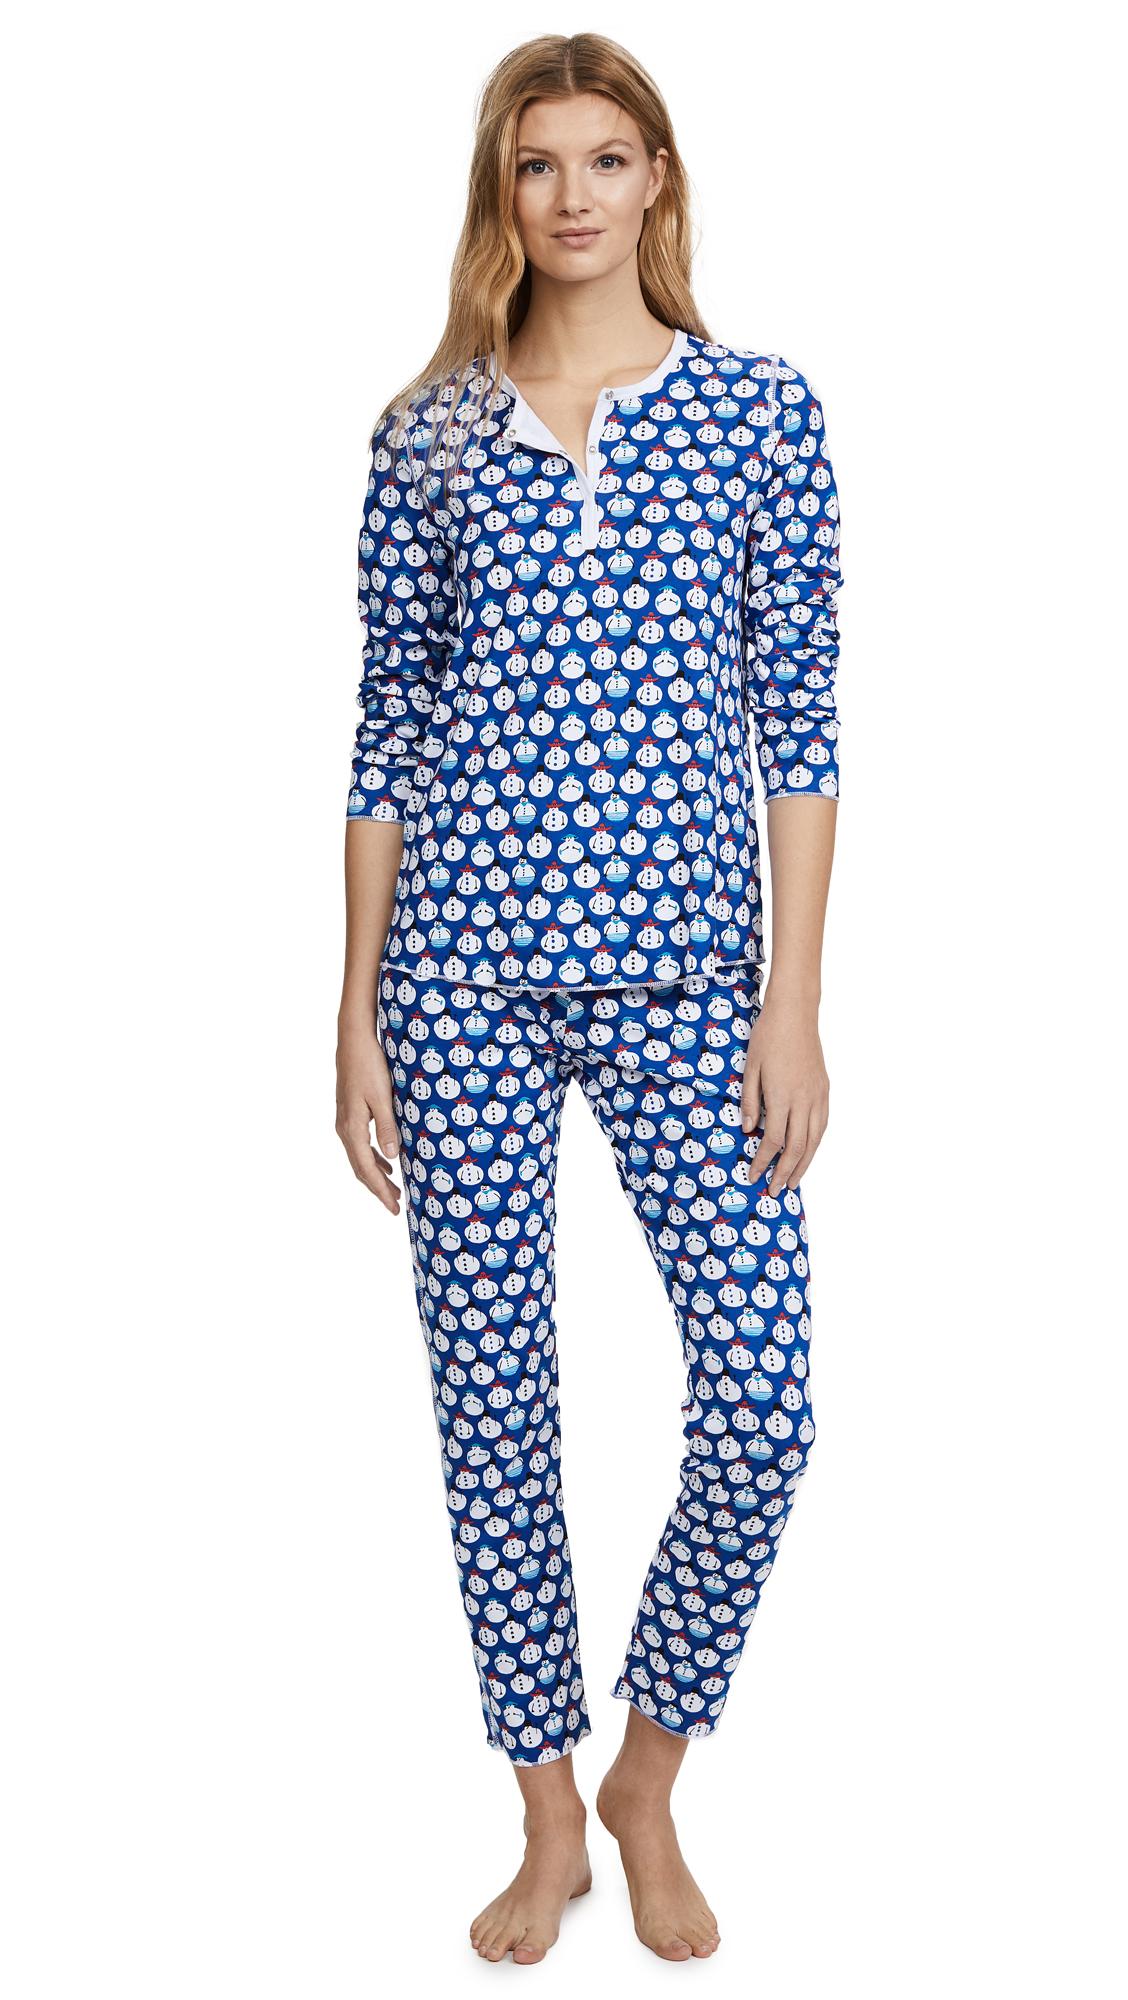 Roller Rabbit Loungewear Sno Global PJ Set